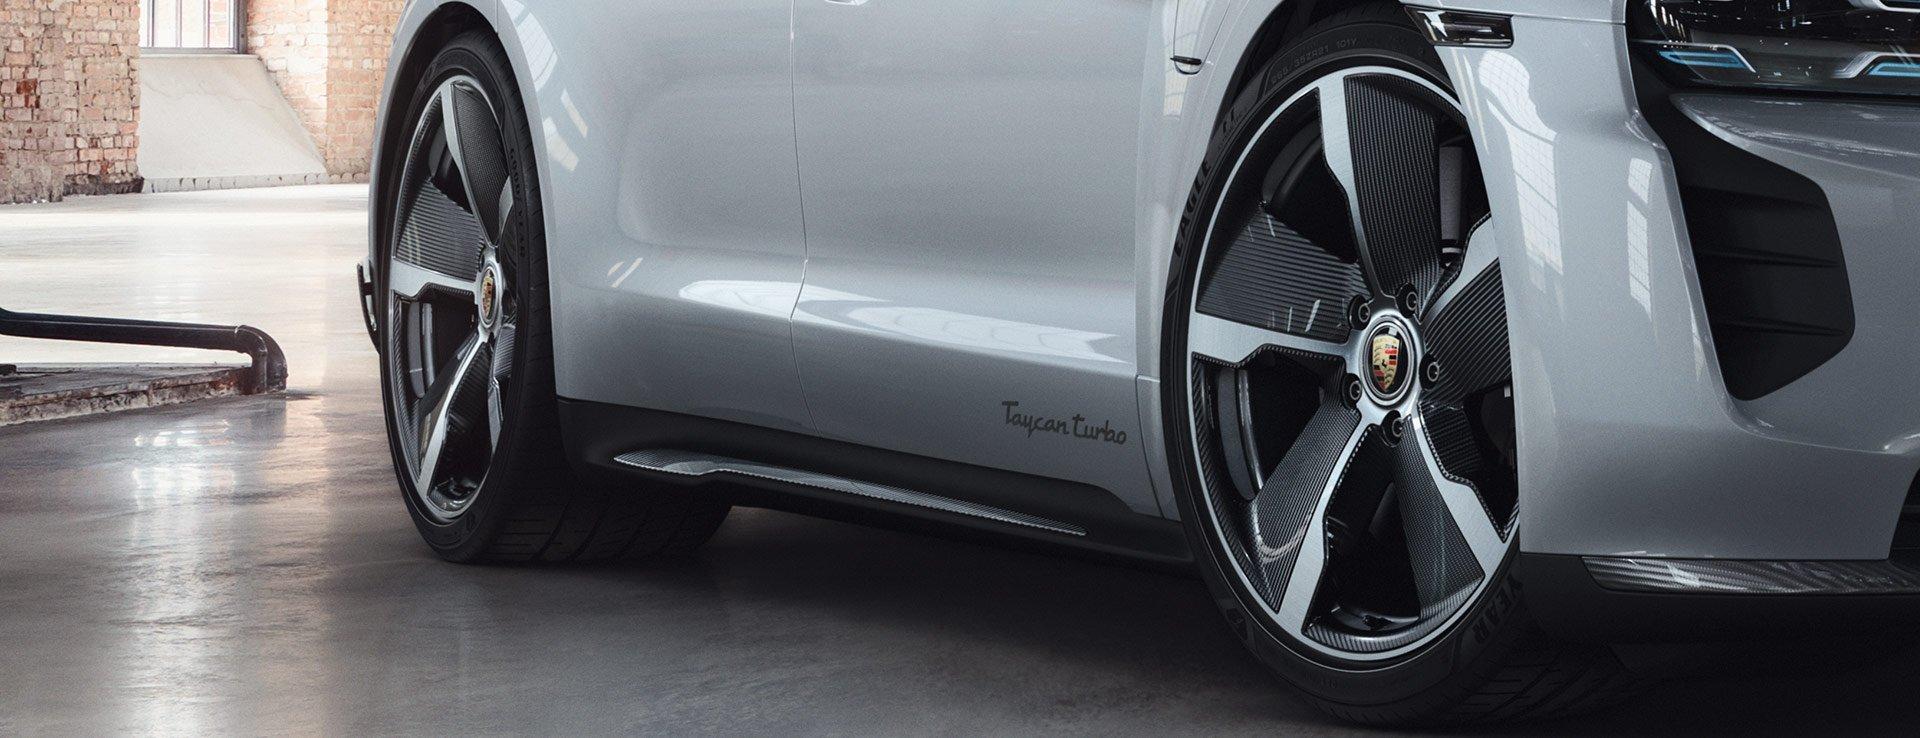 Porsche-Exclusive-Taycan-Turbo-11